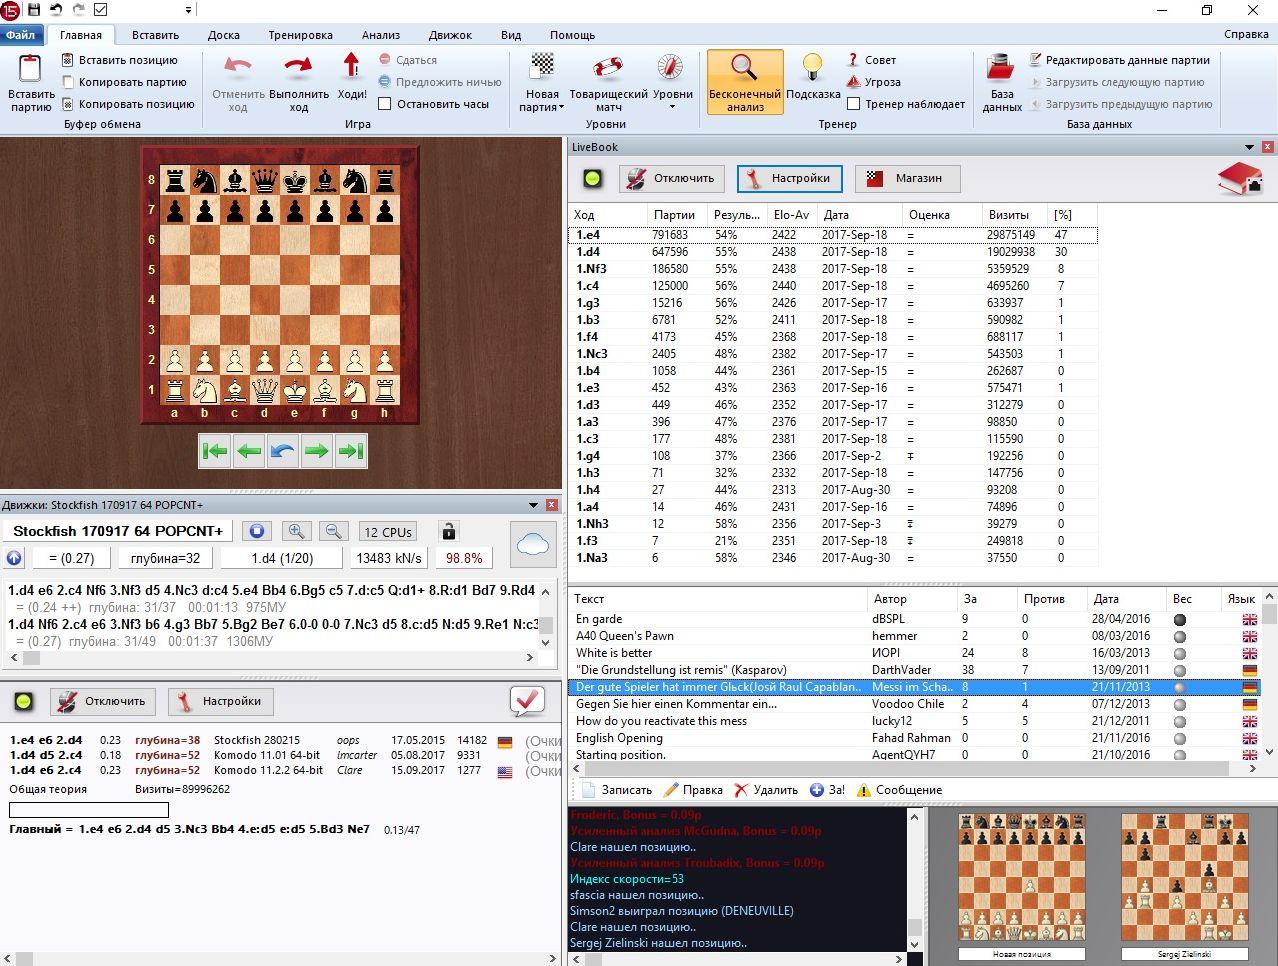 gladiators-chess.ru/images/LiveBOOKful.jpg